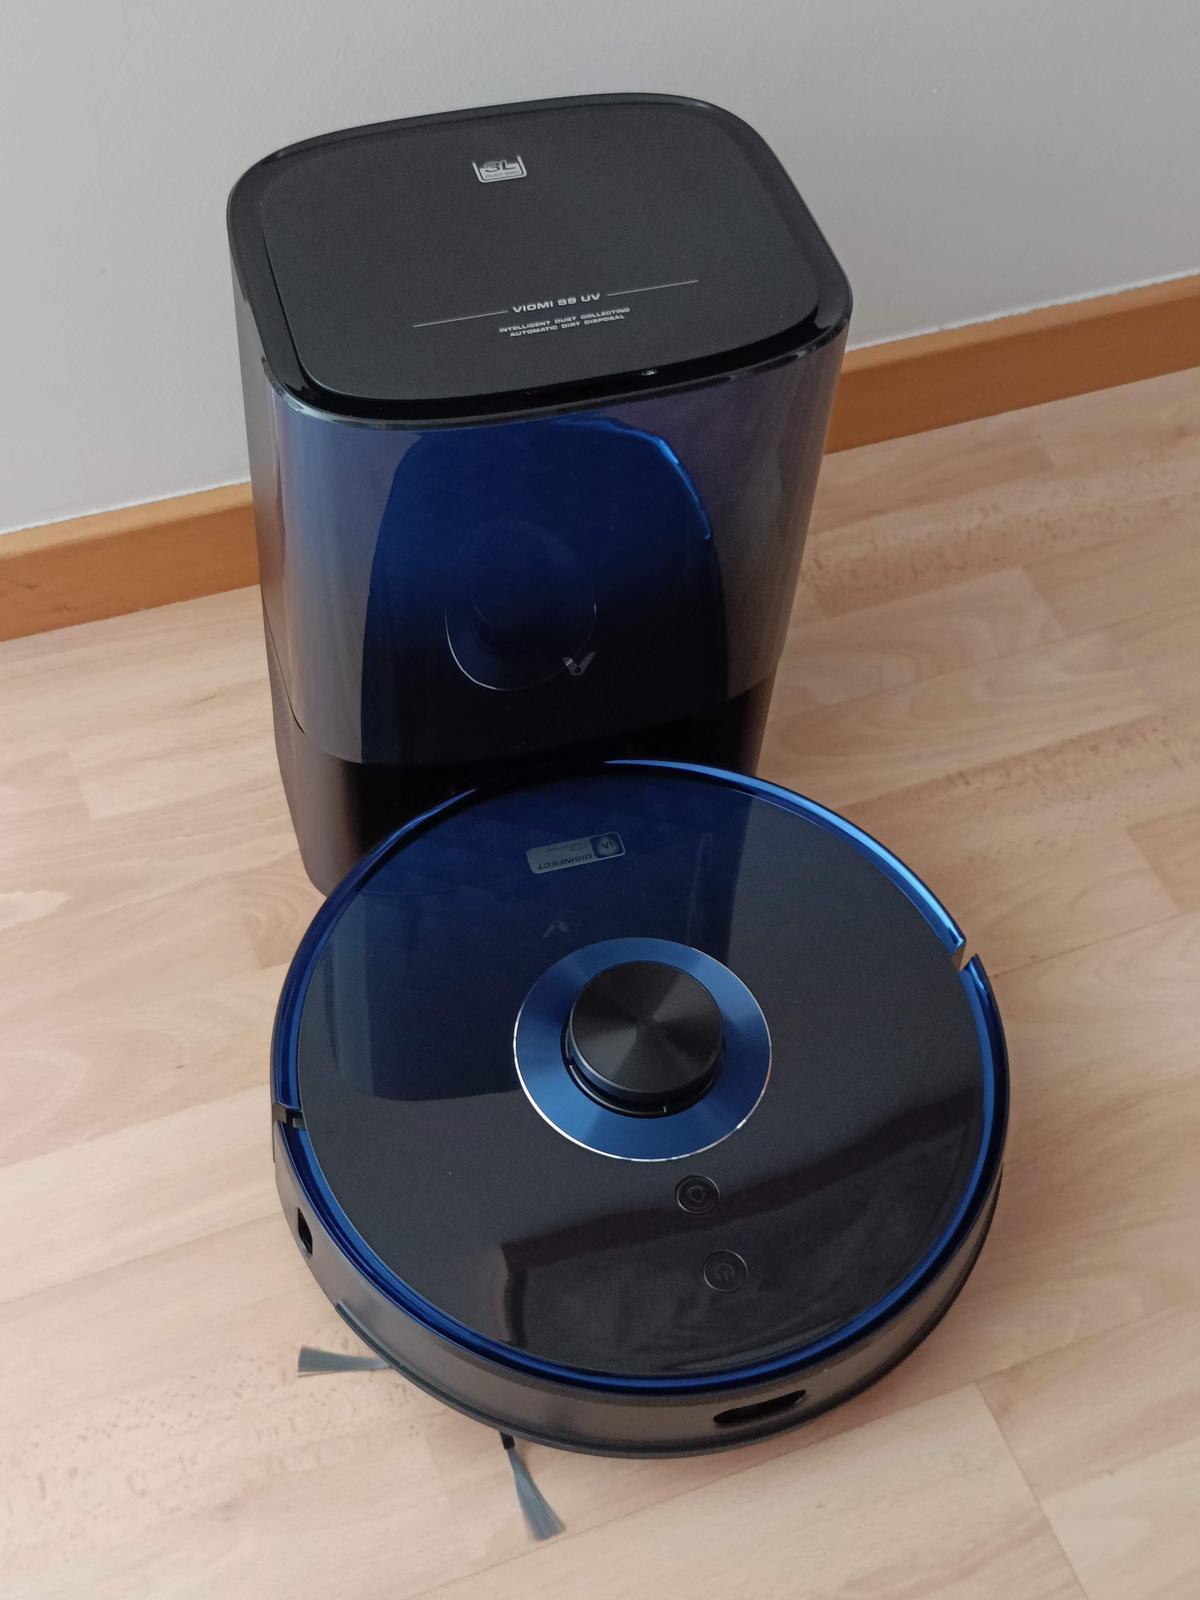 Nueva aspiradora Viomi con sistema de desinfección.